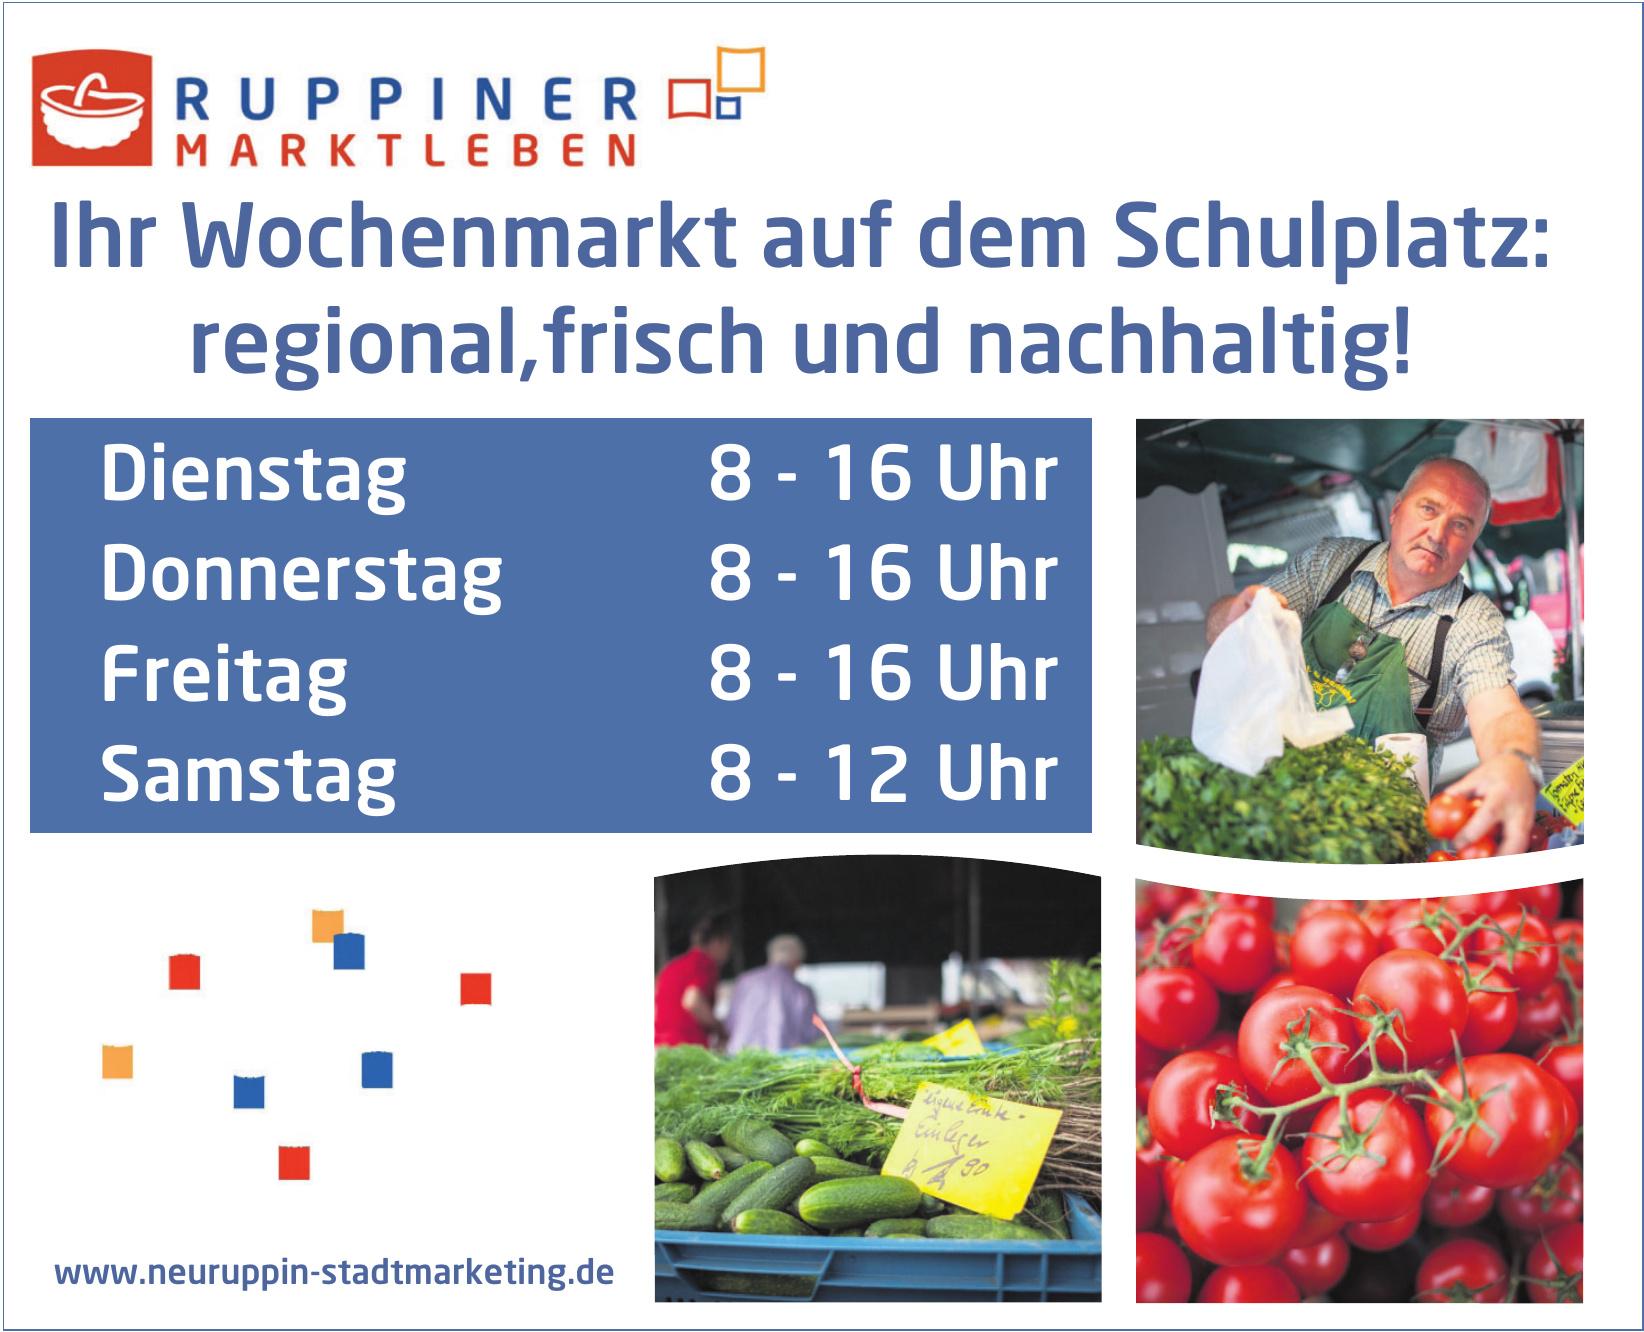 Neuruppin Stadtmarketing